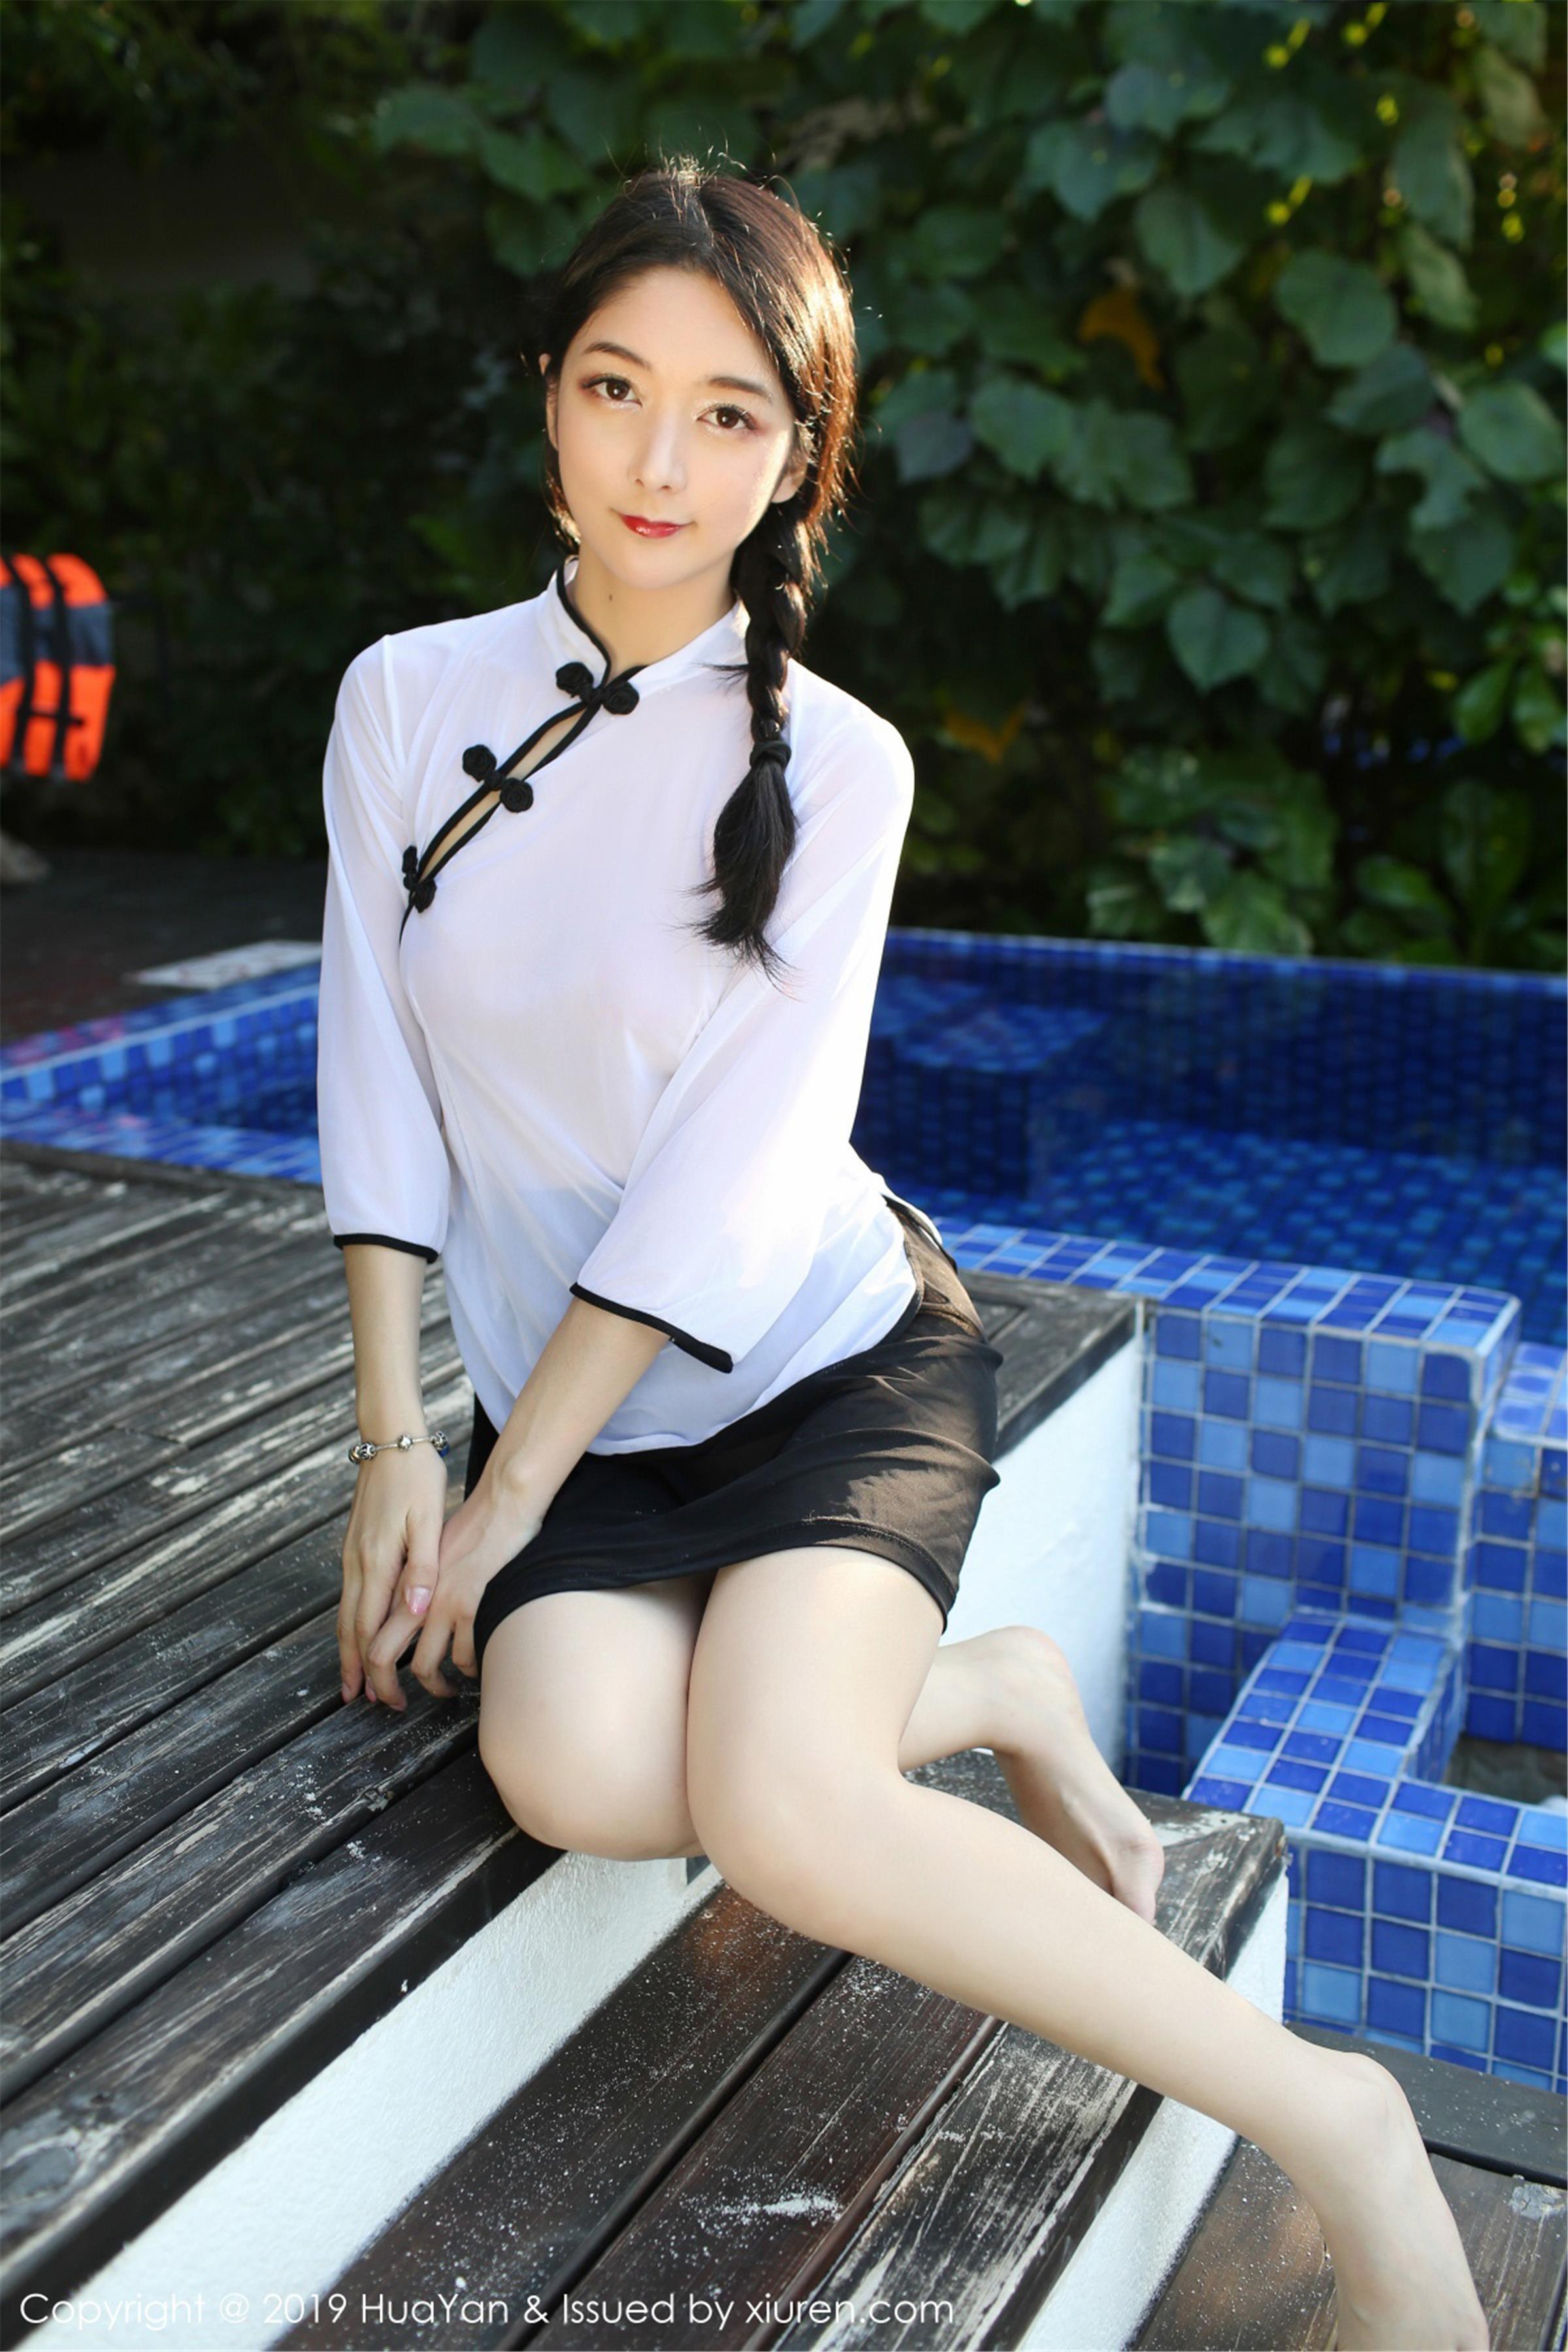 [HuaYan花の颜]HY20190425VOL0065 Angela喜欢猫 白色透视民国女生制服与白色短袖性感私房写真集